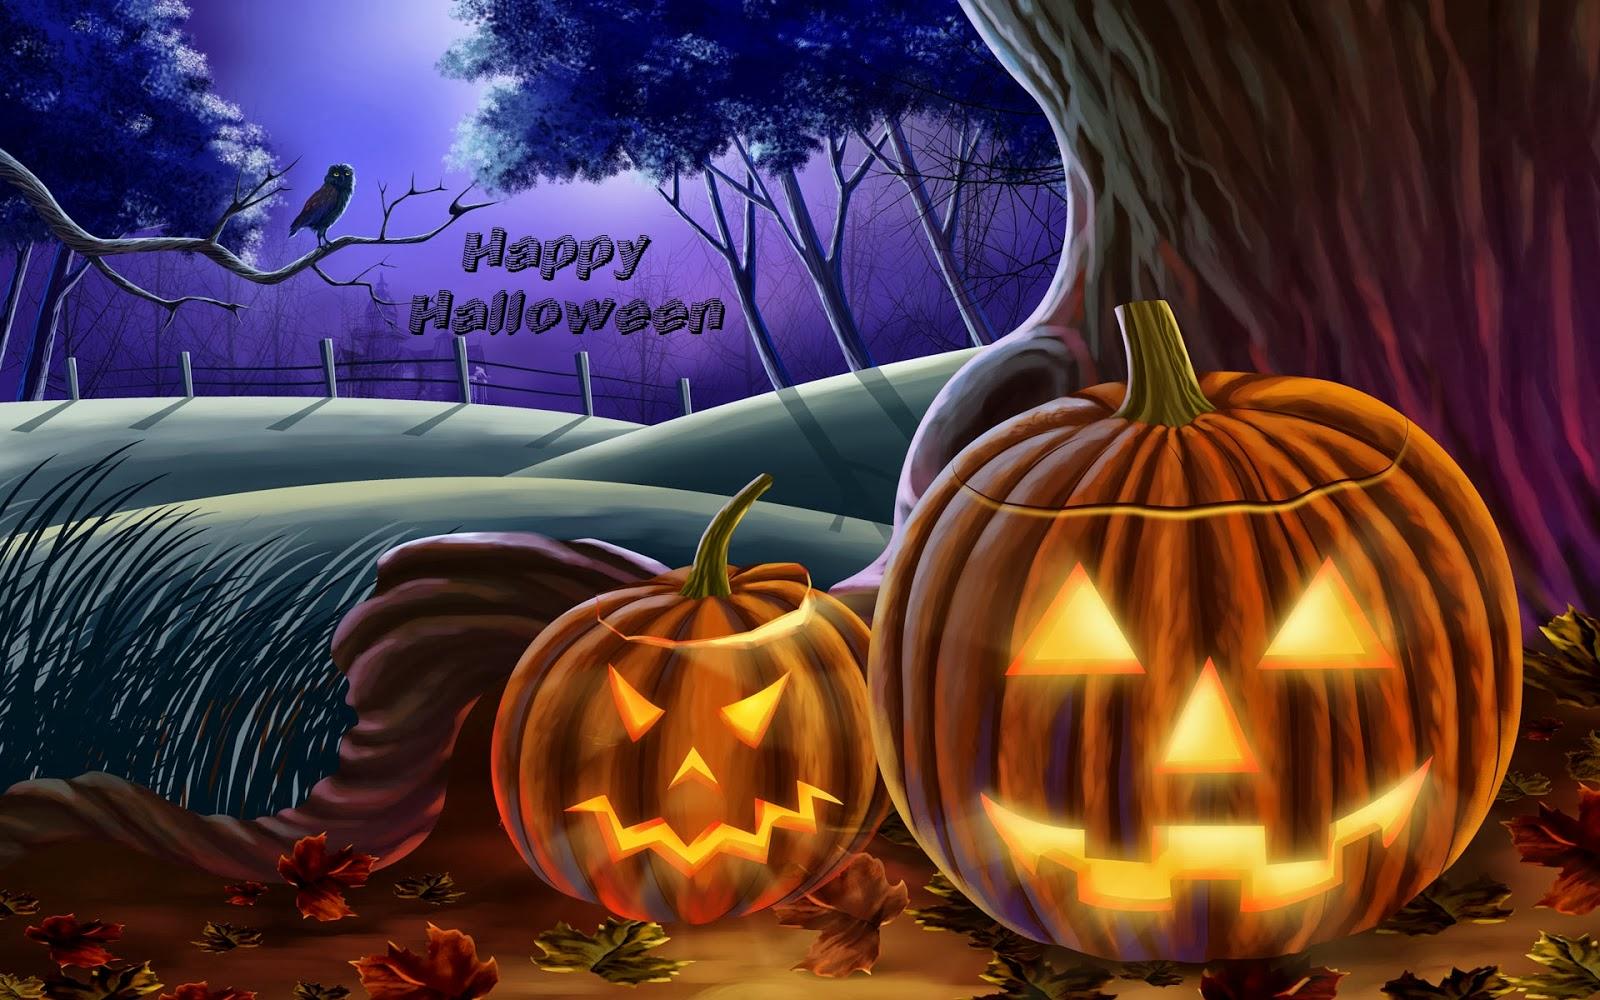 Hot & Sexy Photos of Happy Halloween Wishes | Festival Chaska